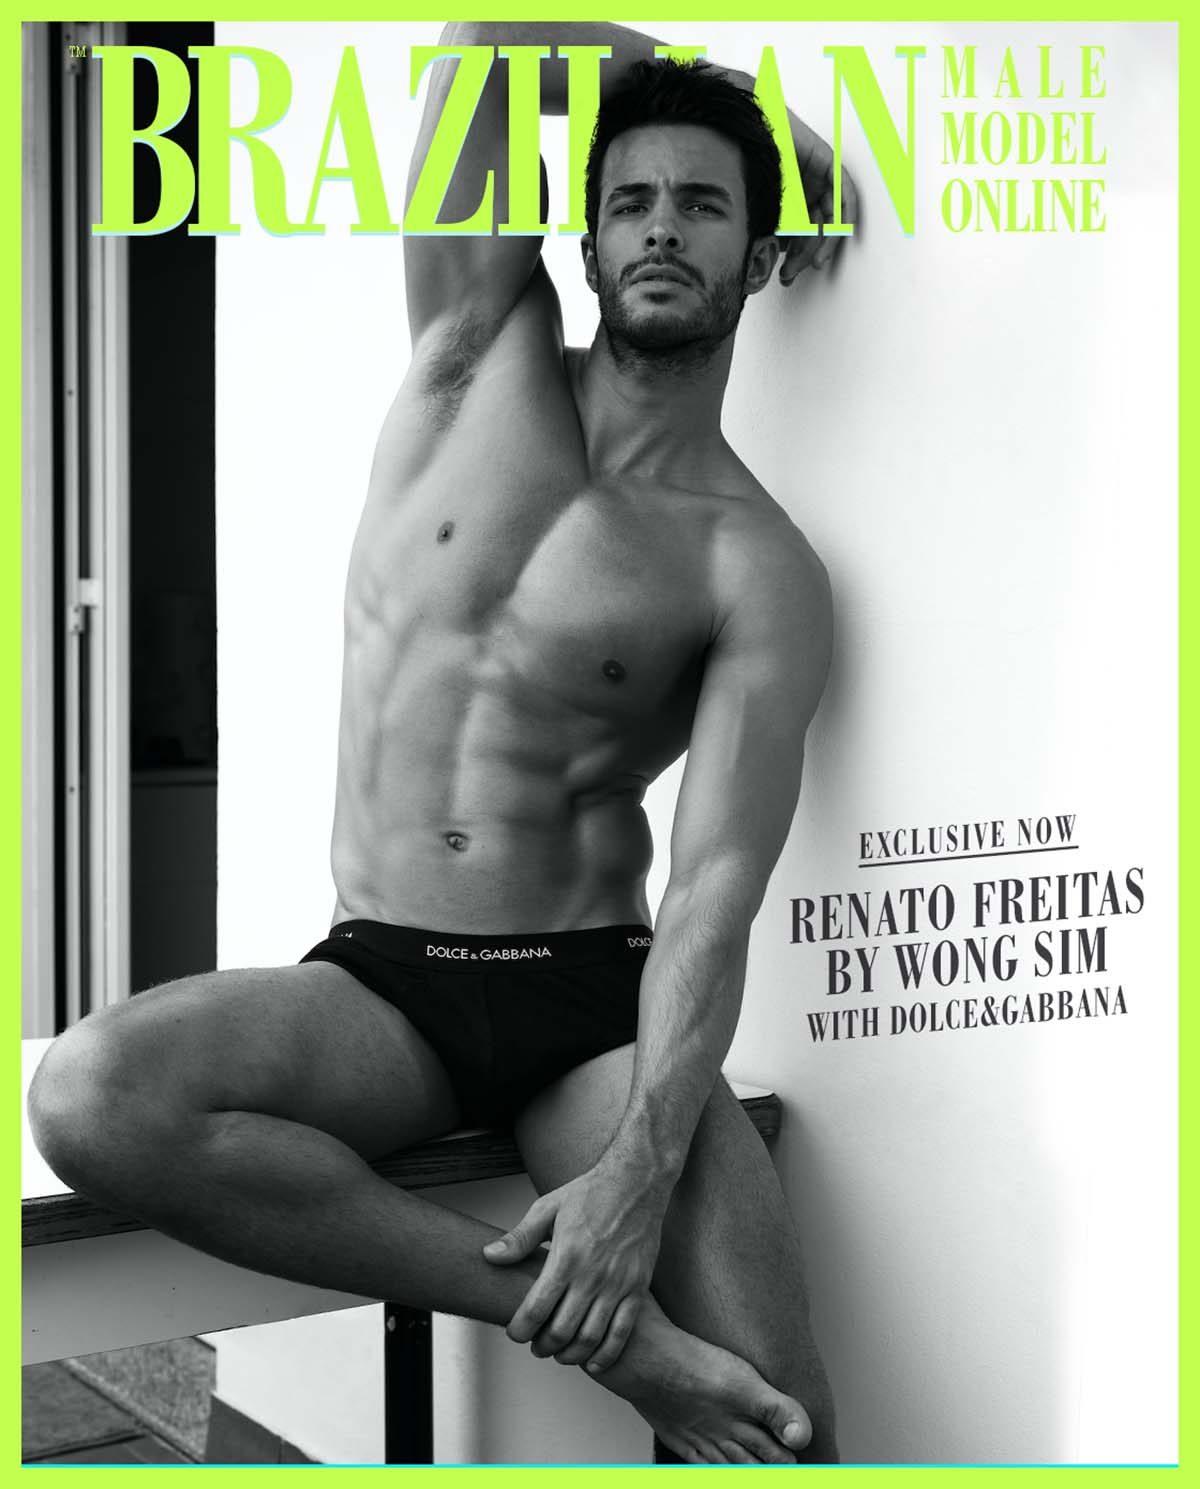 Renato Freitas by Wong Sim with Dolce&Gabbana